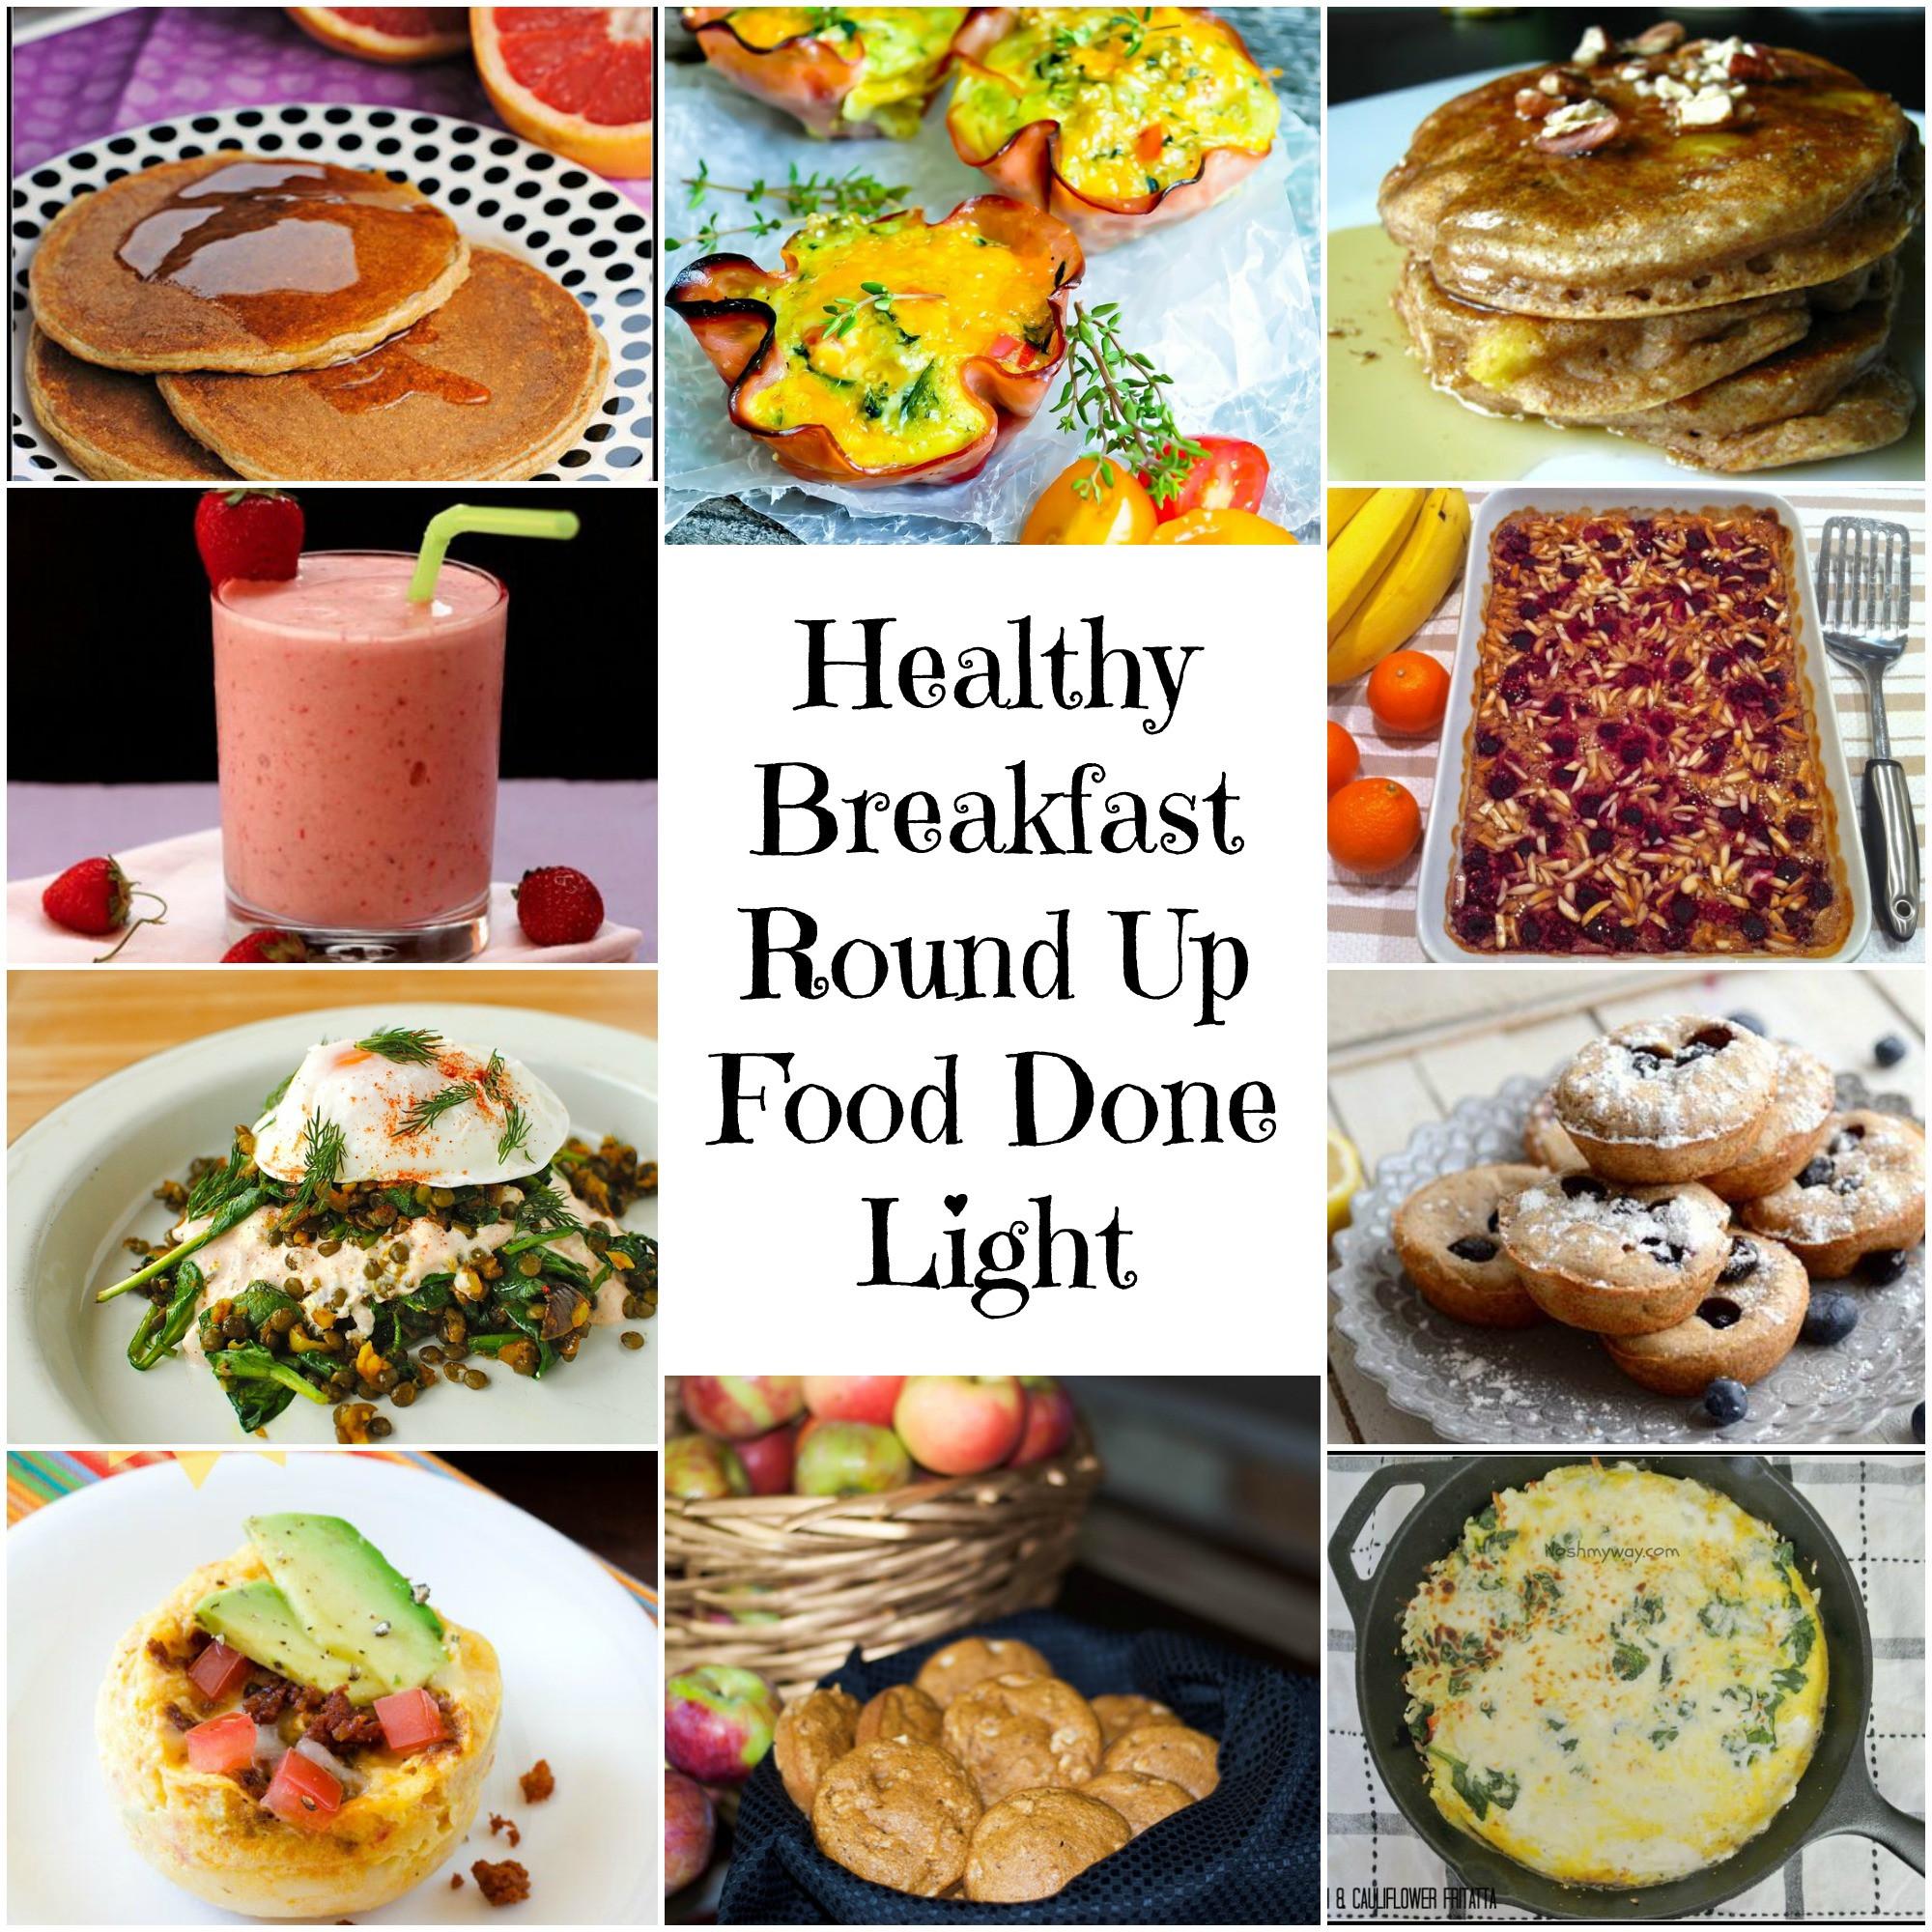 Healthy Light Breakfast  Healthy Breakfast Recipe Round Up Food Done Light